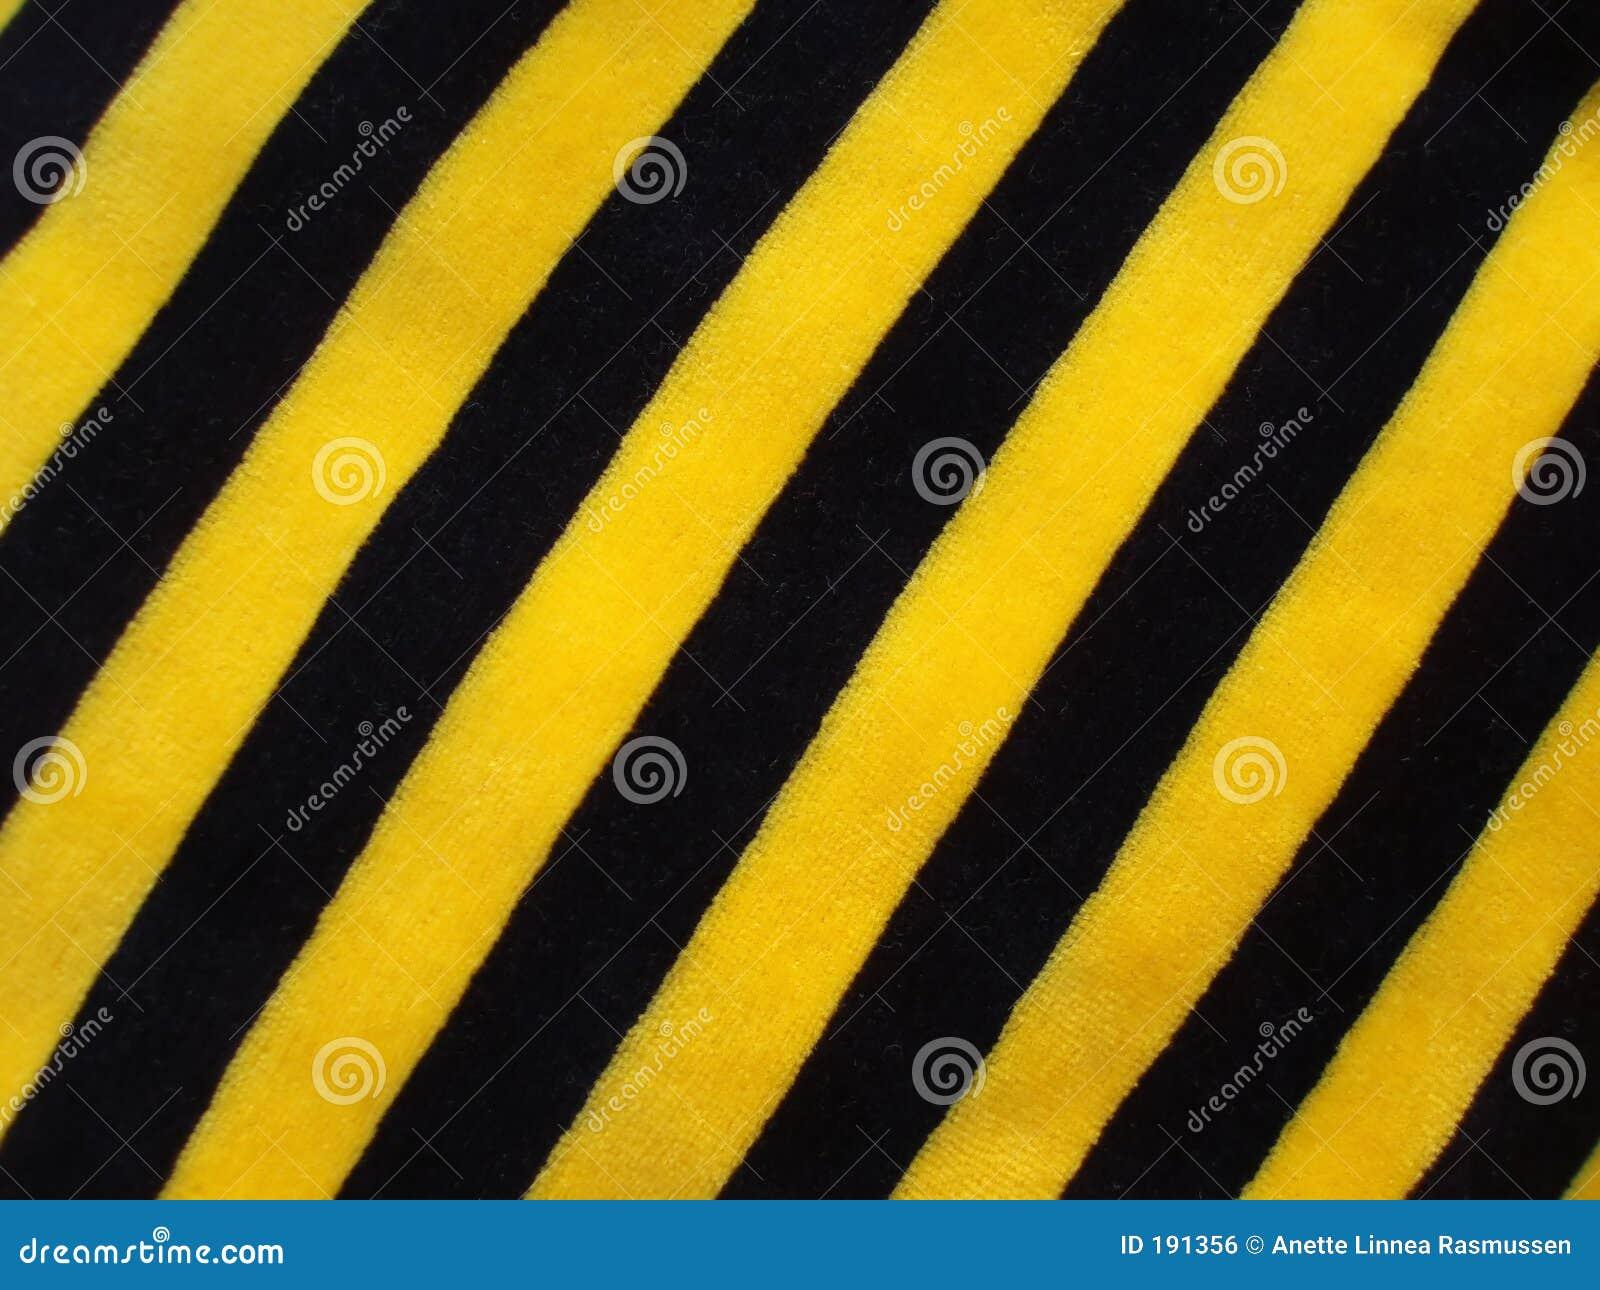 Tela rayada negra y amarilla